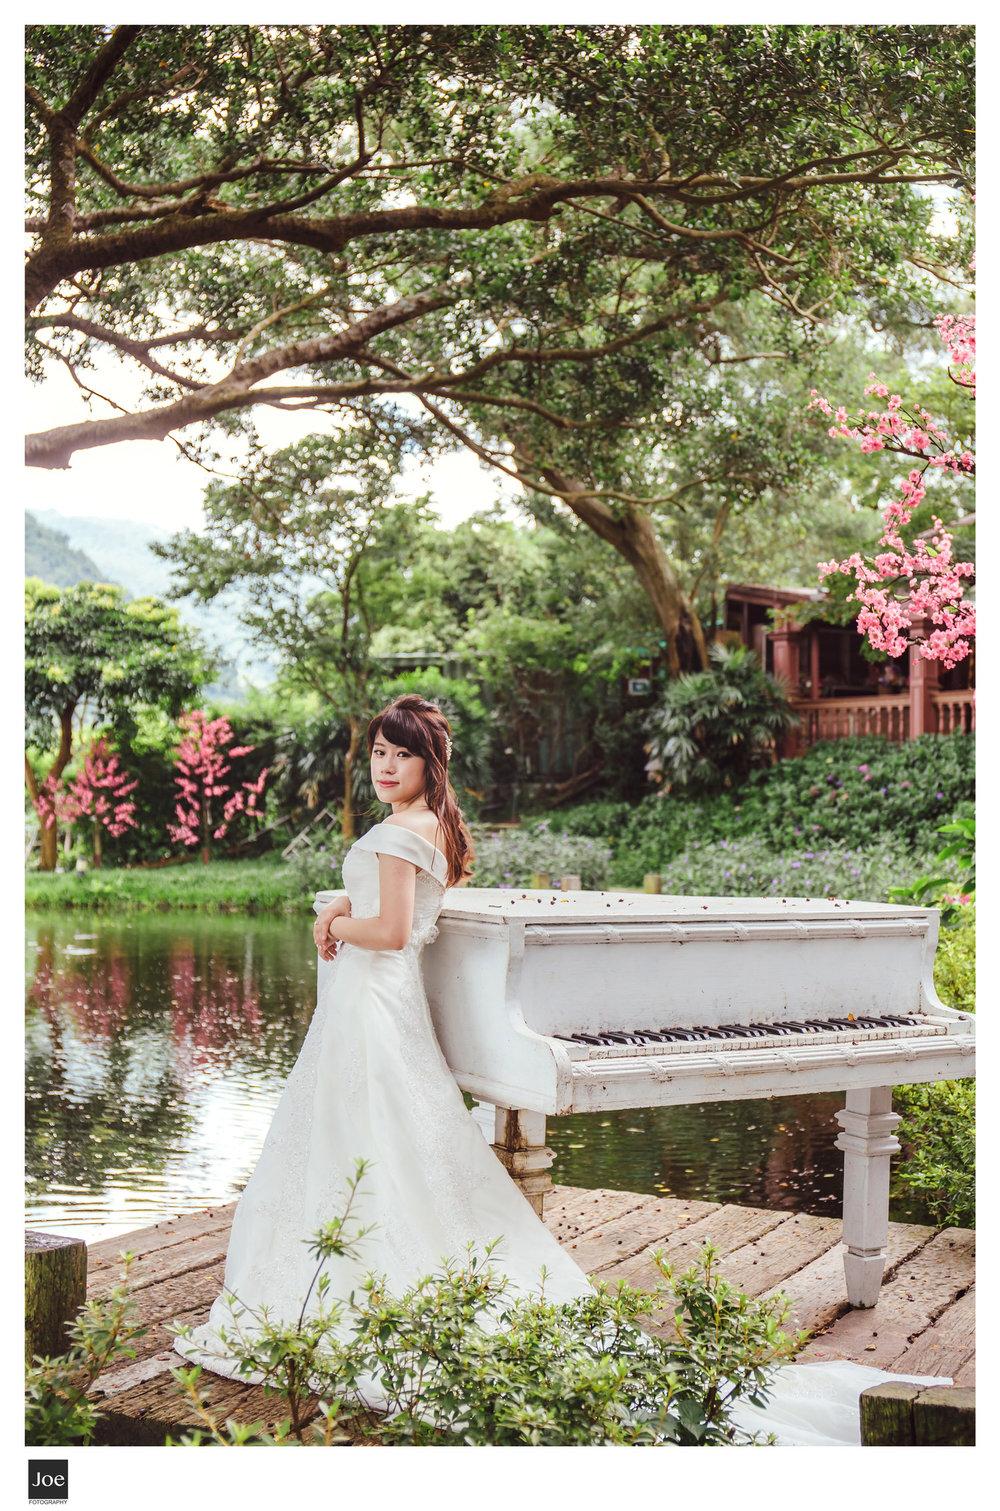 taiwan-pre-wedding-roger-wing-joe-fotography-021.jpg